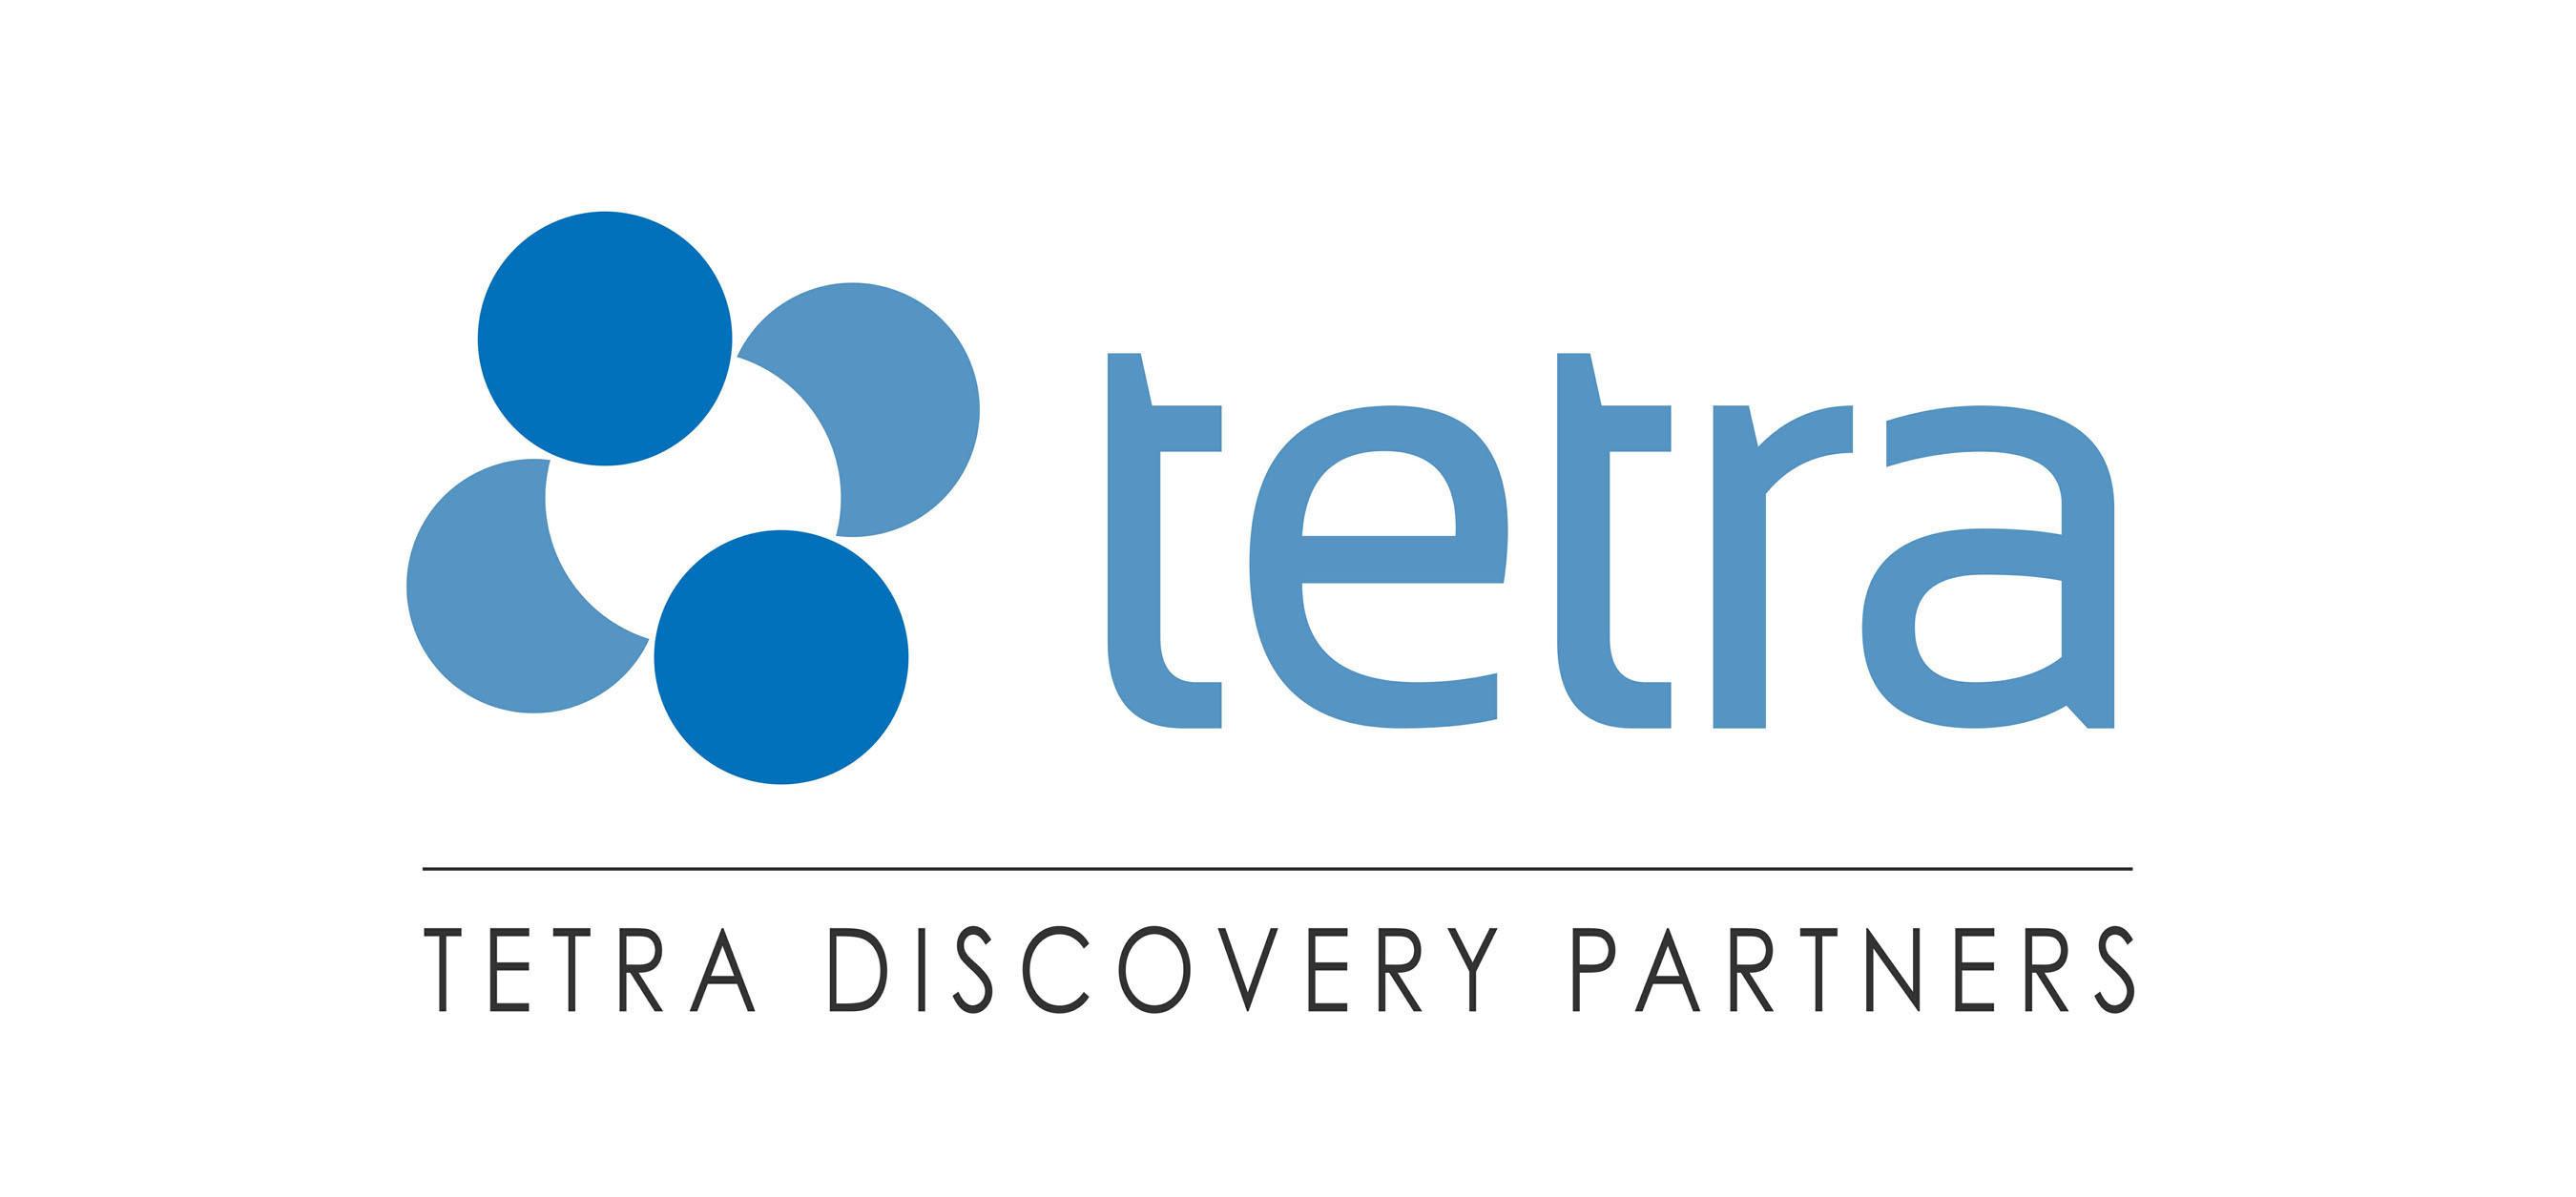 TETRA DISCOVERY PARTNERS LLC LOGO